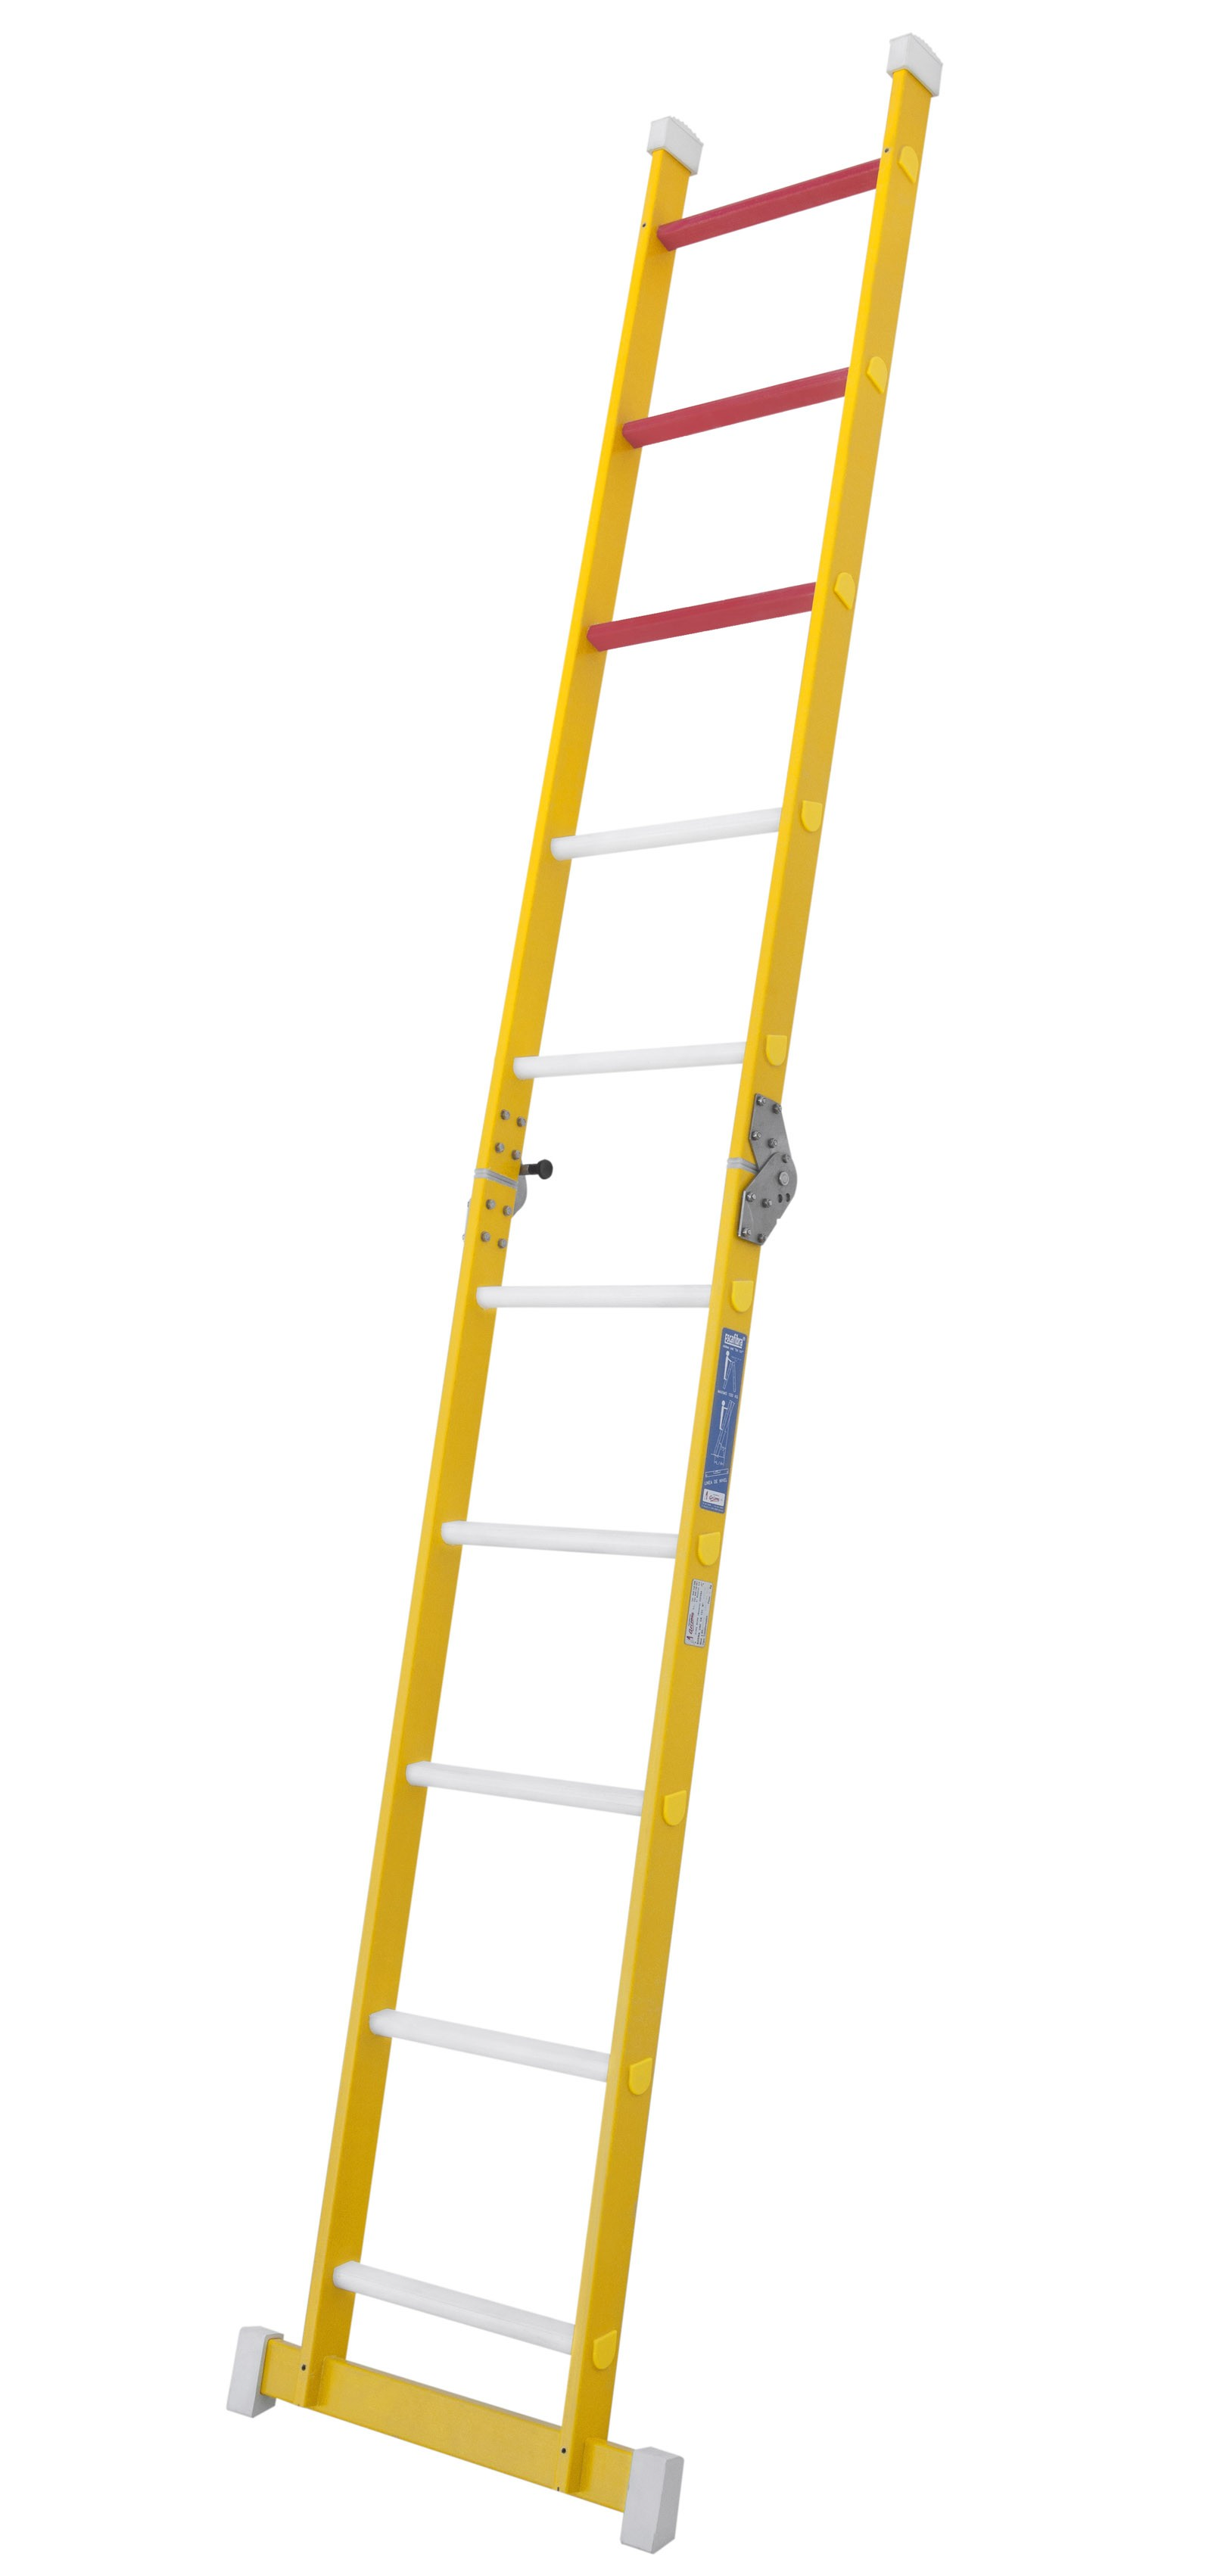 Fibreglass Single-section Folding Ladder